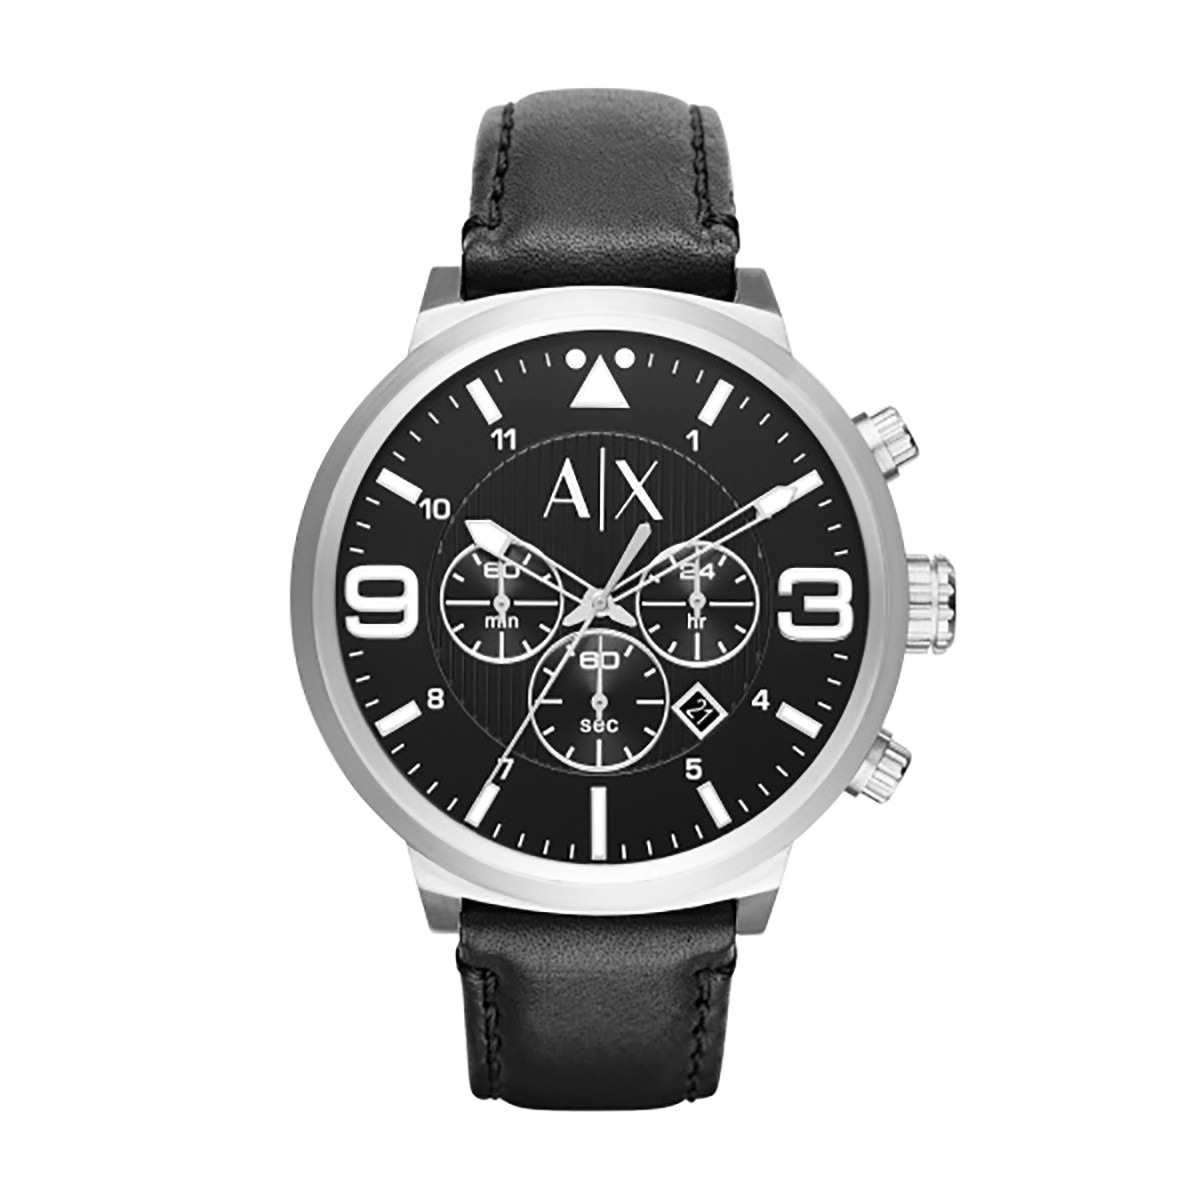 7ae28151a0e8 reloj armani exchange ax1371 envio gratis. Cargando zoom.